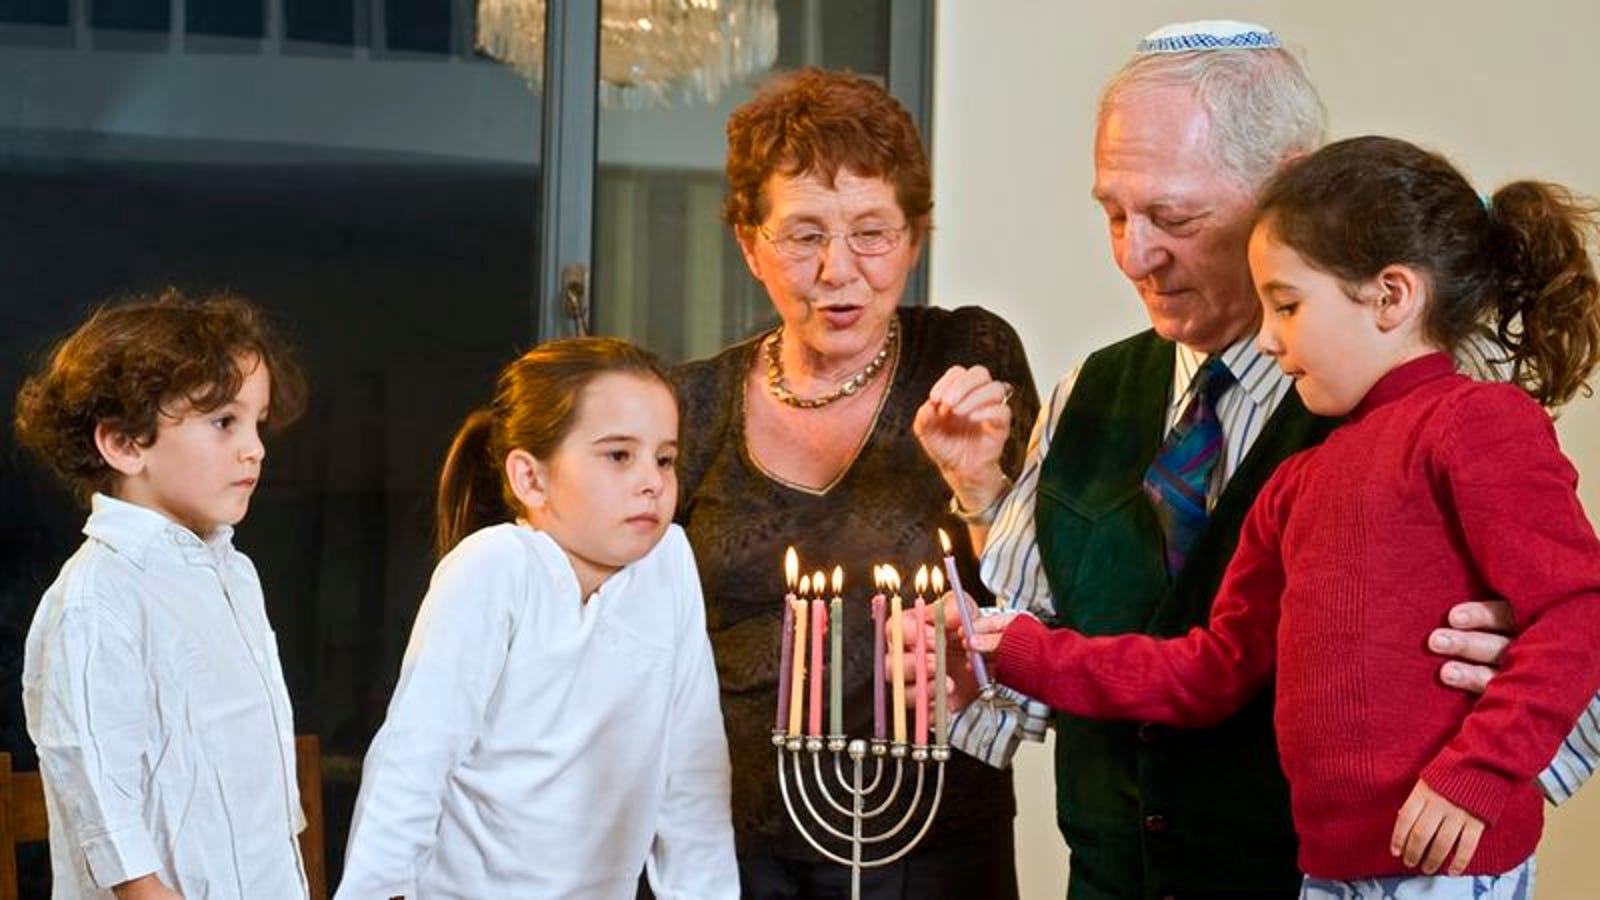 Will Hanukkah Consume You?